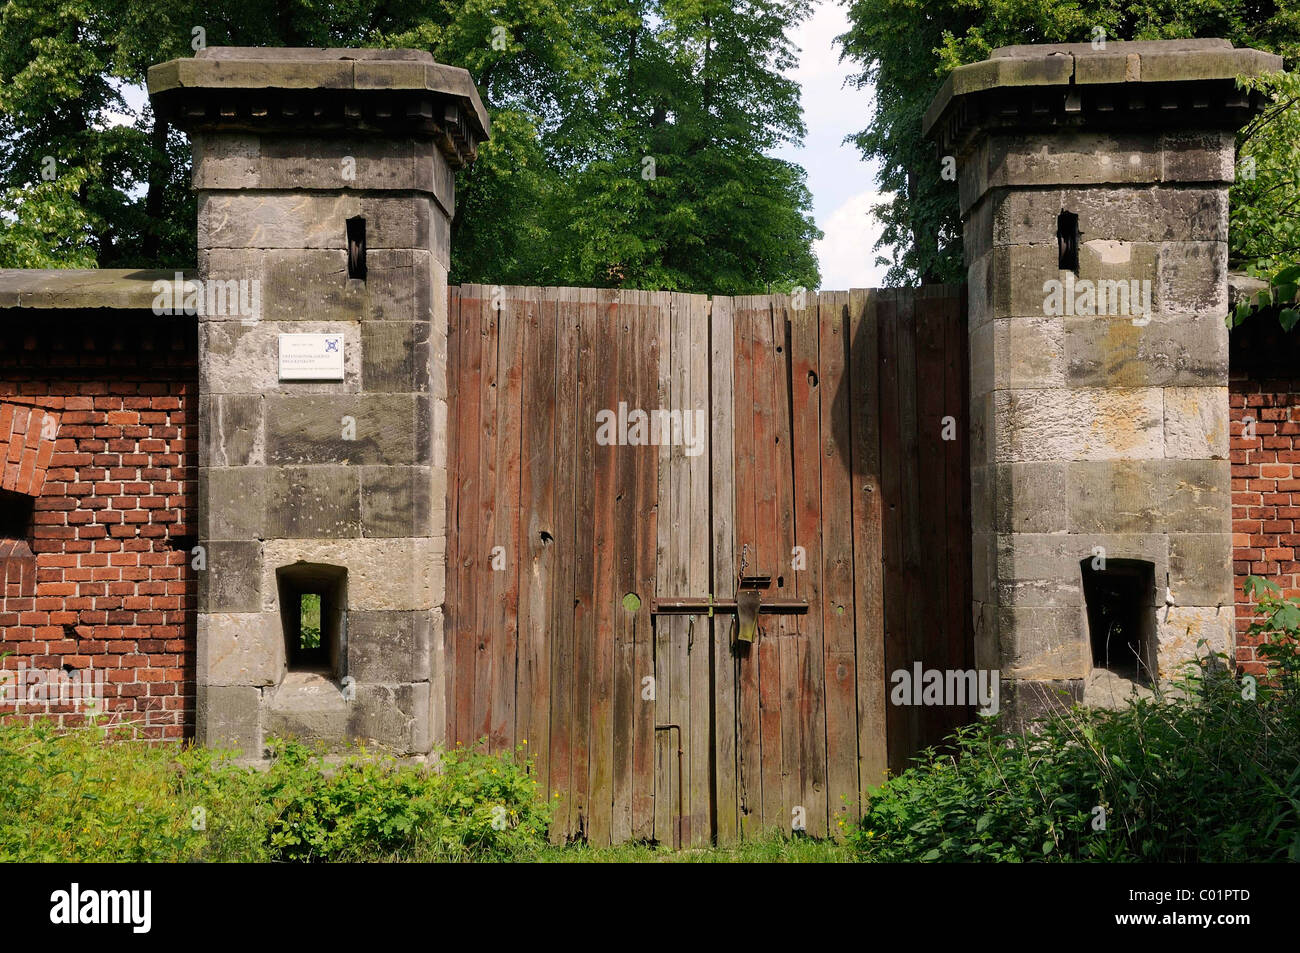 Devensive barracks Brueckenkopf, Torgau, Landkreis Nordsachsen county, Saxony, Germany, Europe Stock Photo